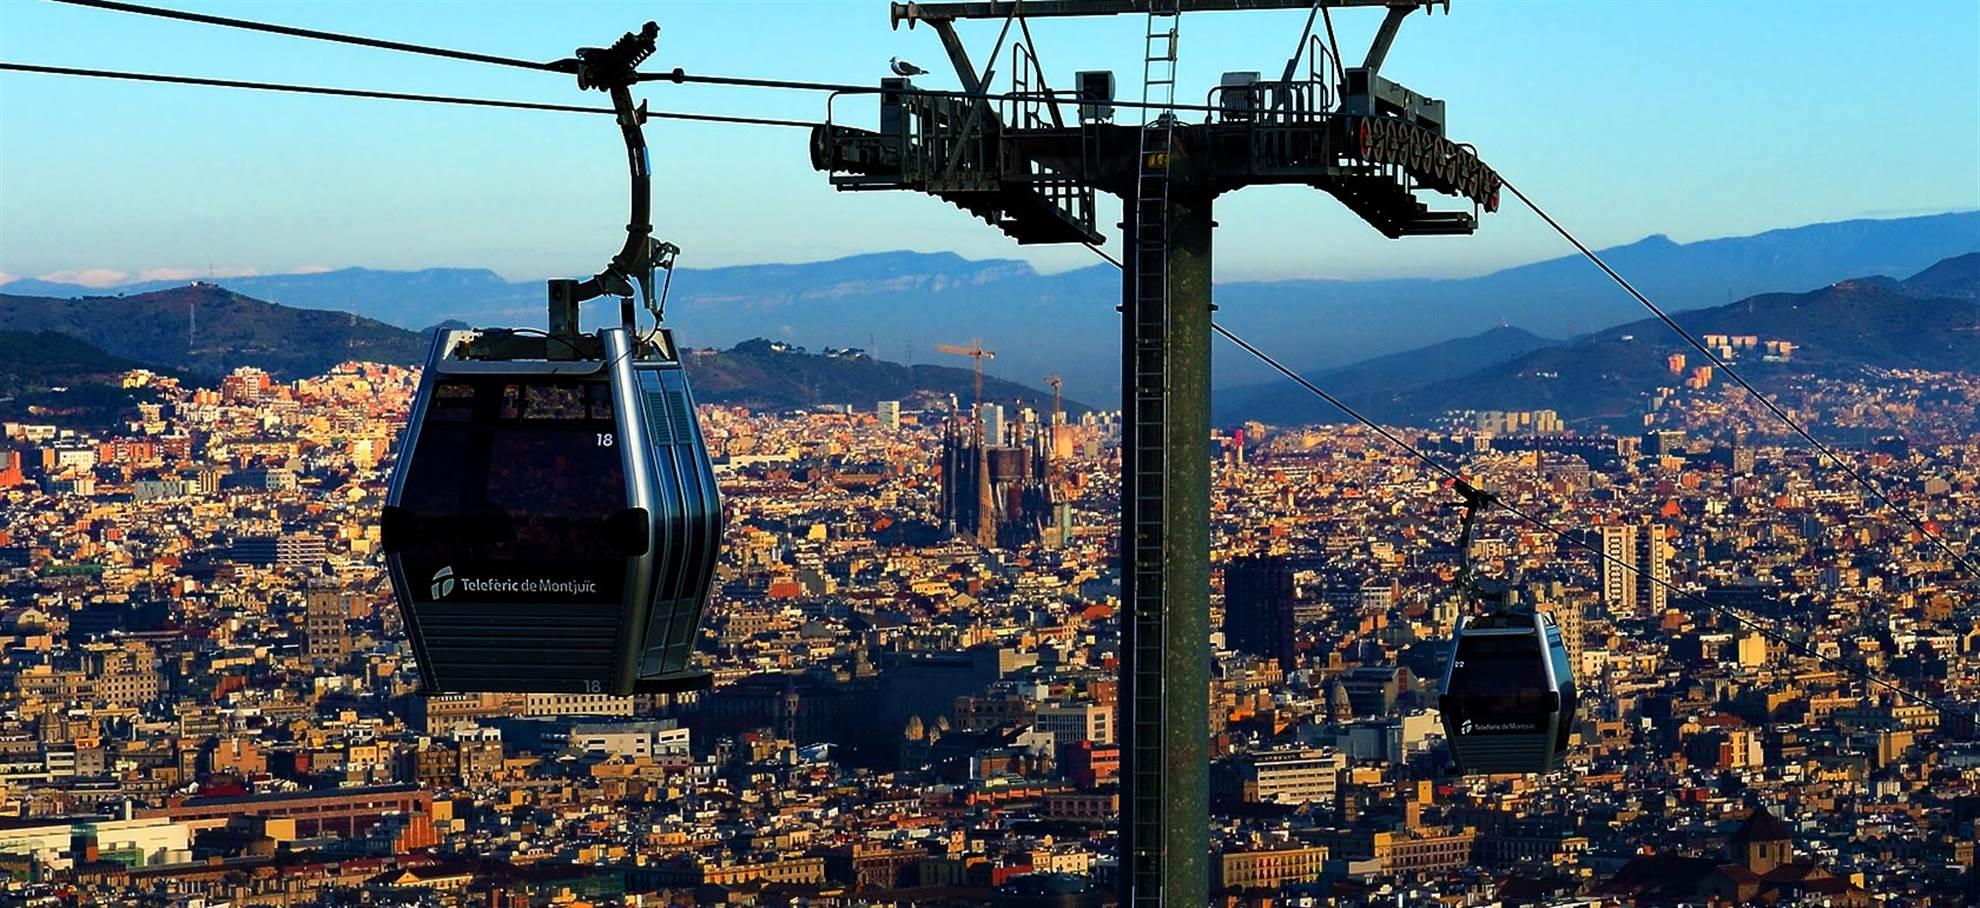 Seilbahn Barcelona - Teleferic de Montjuic